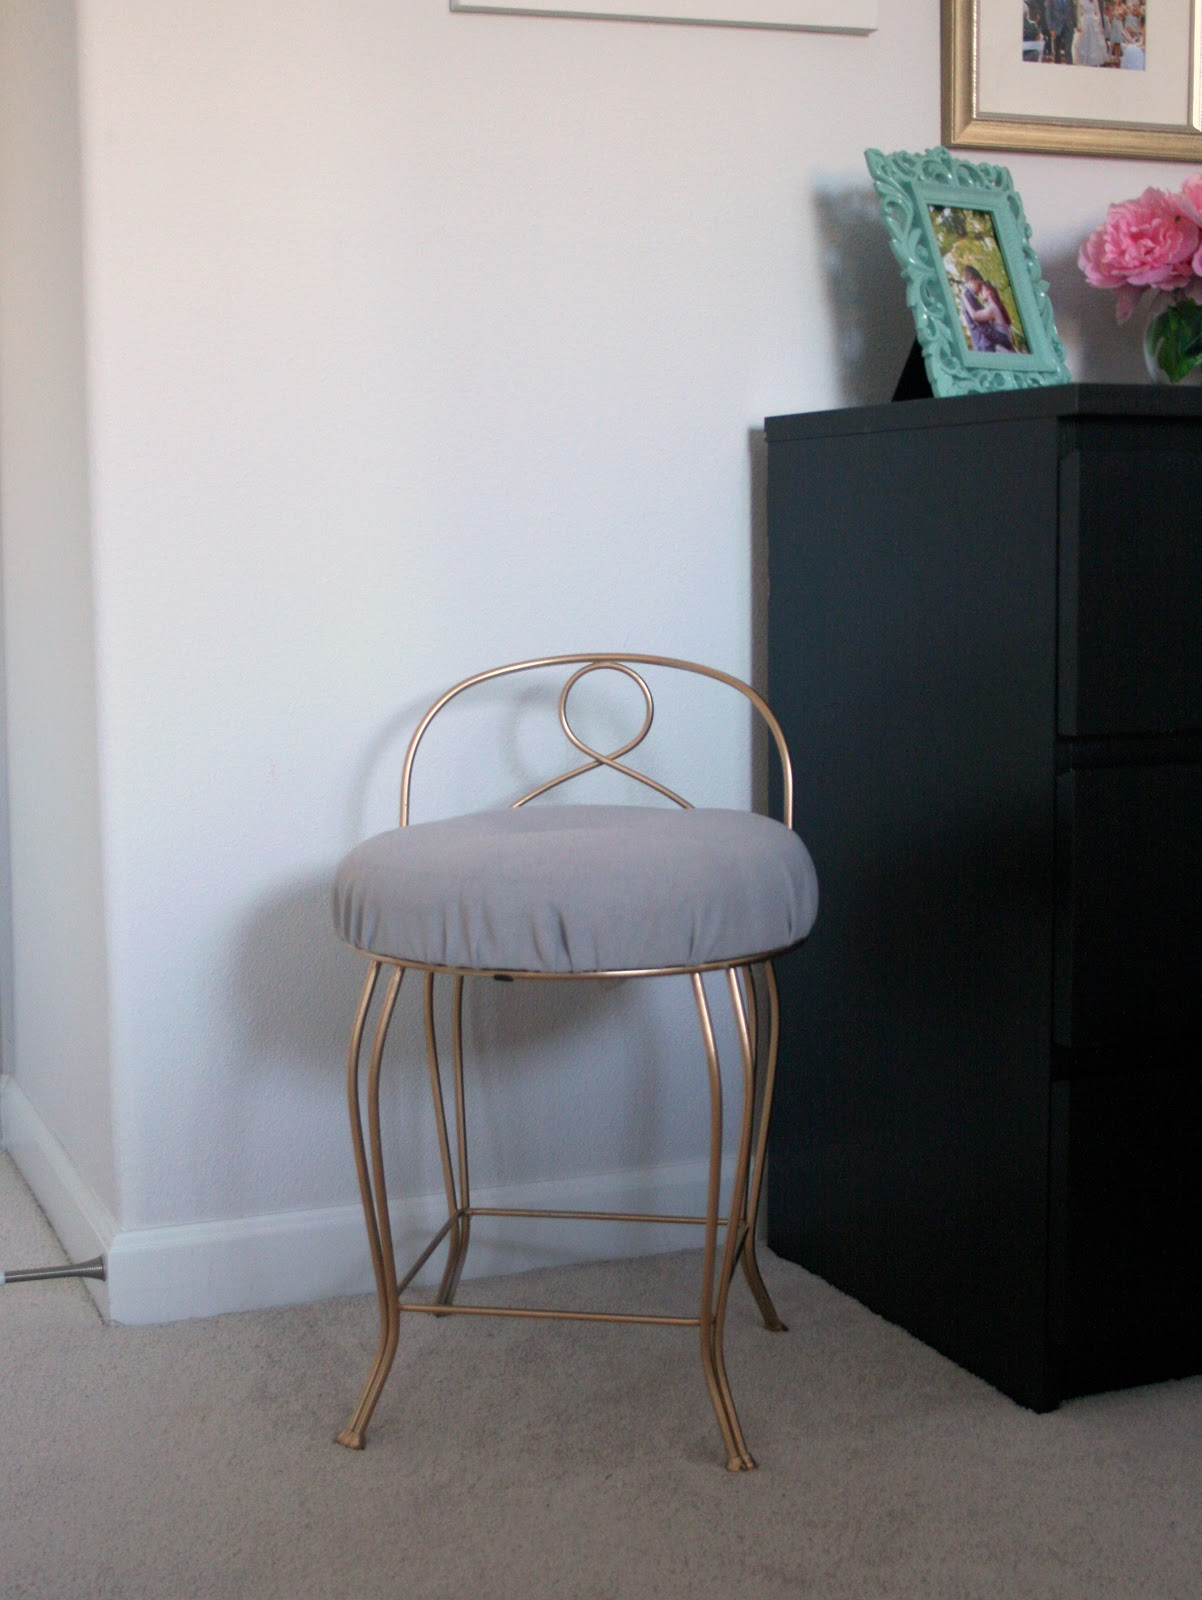 vintage vanity chair lift rental furniture re do pretty stool create enjoy